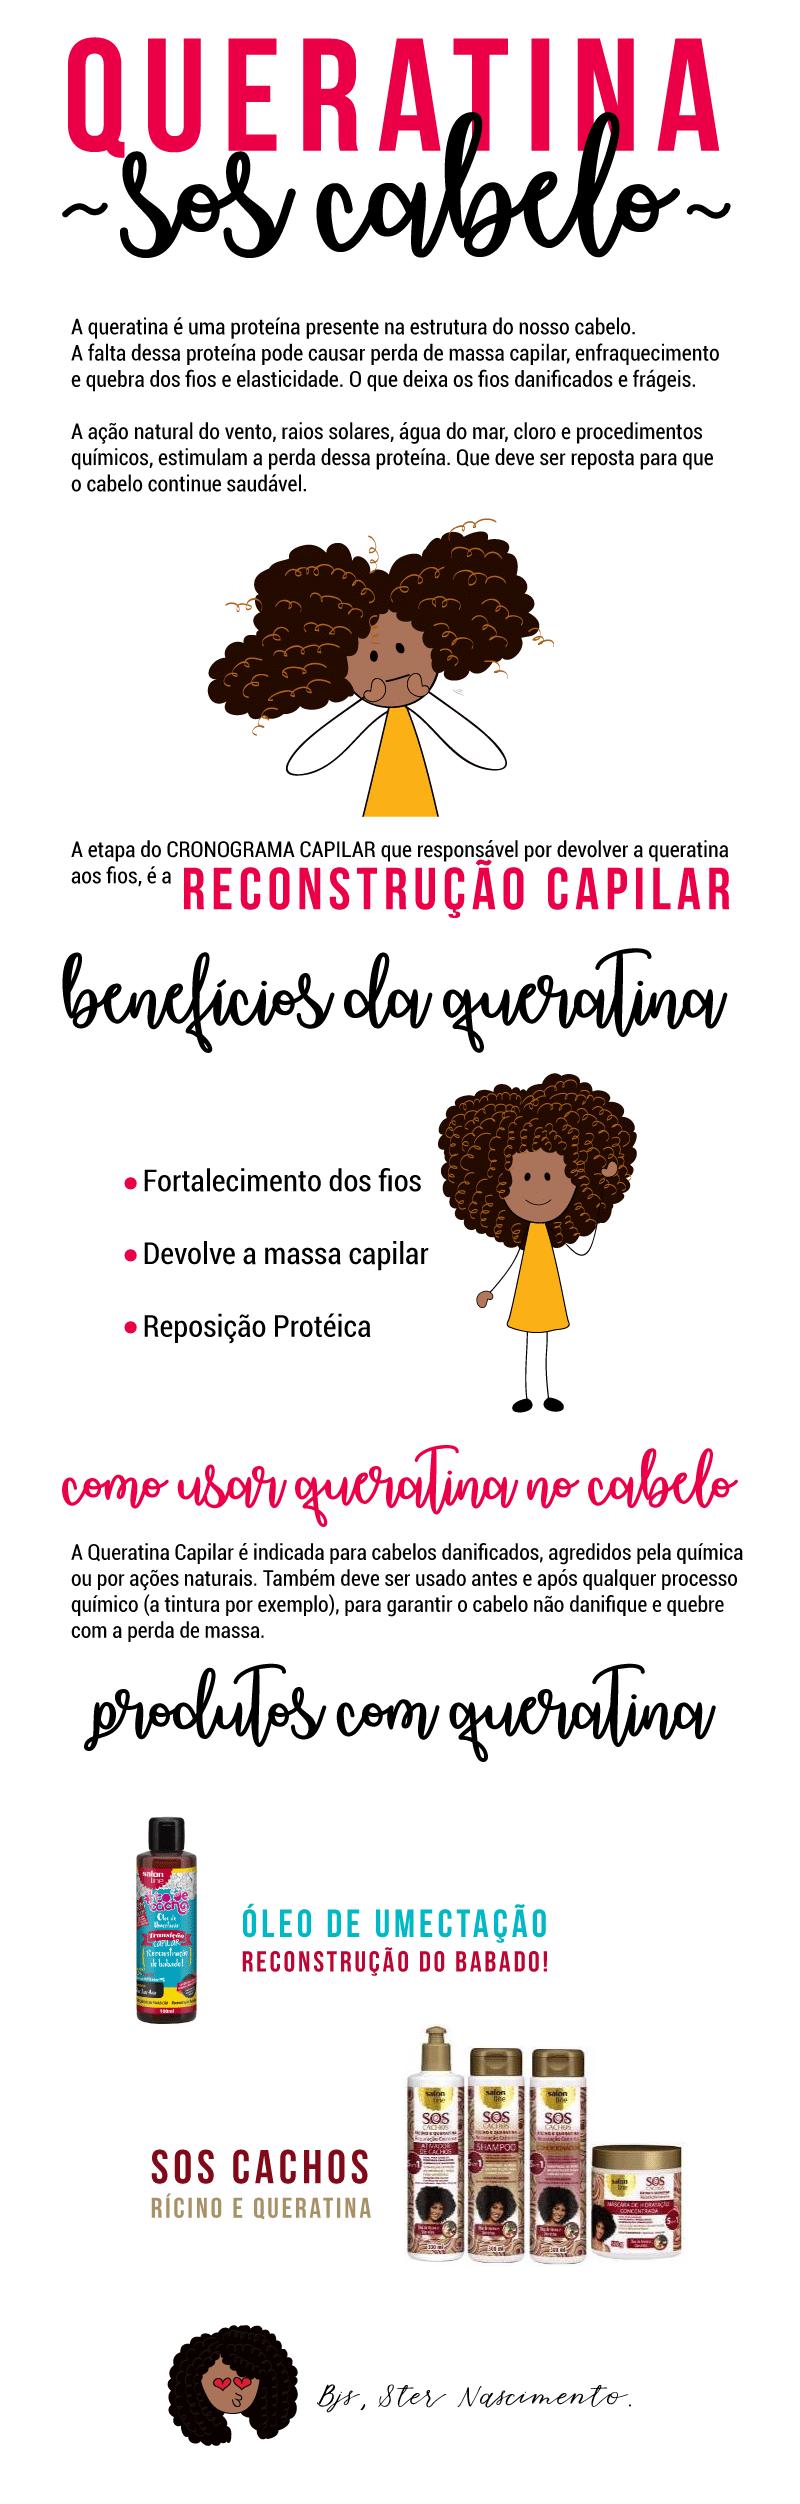 Texto Outubro - Queratina Capilar: conheça os seus benefícios